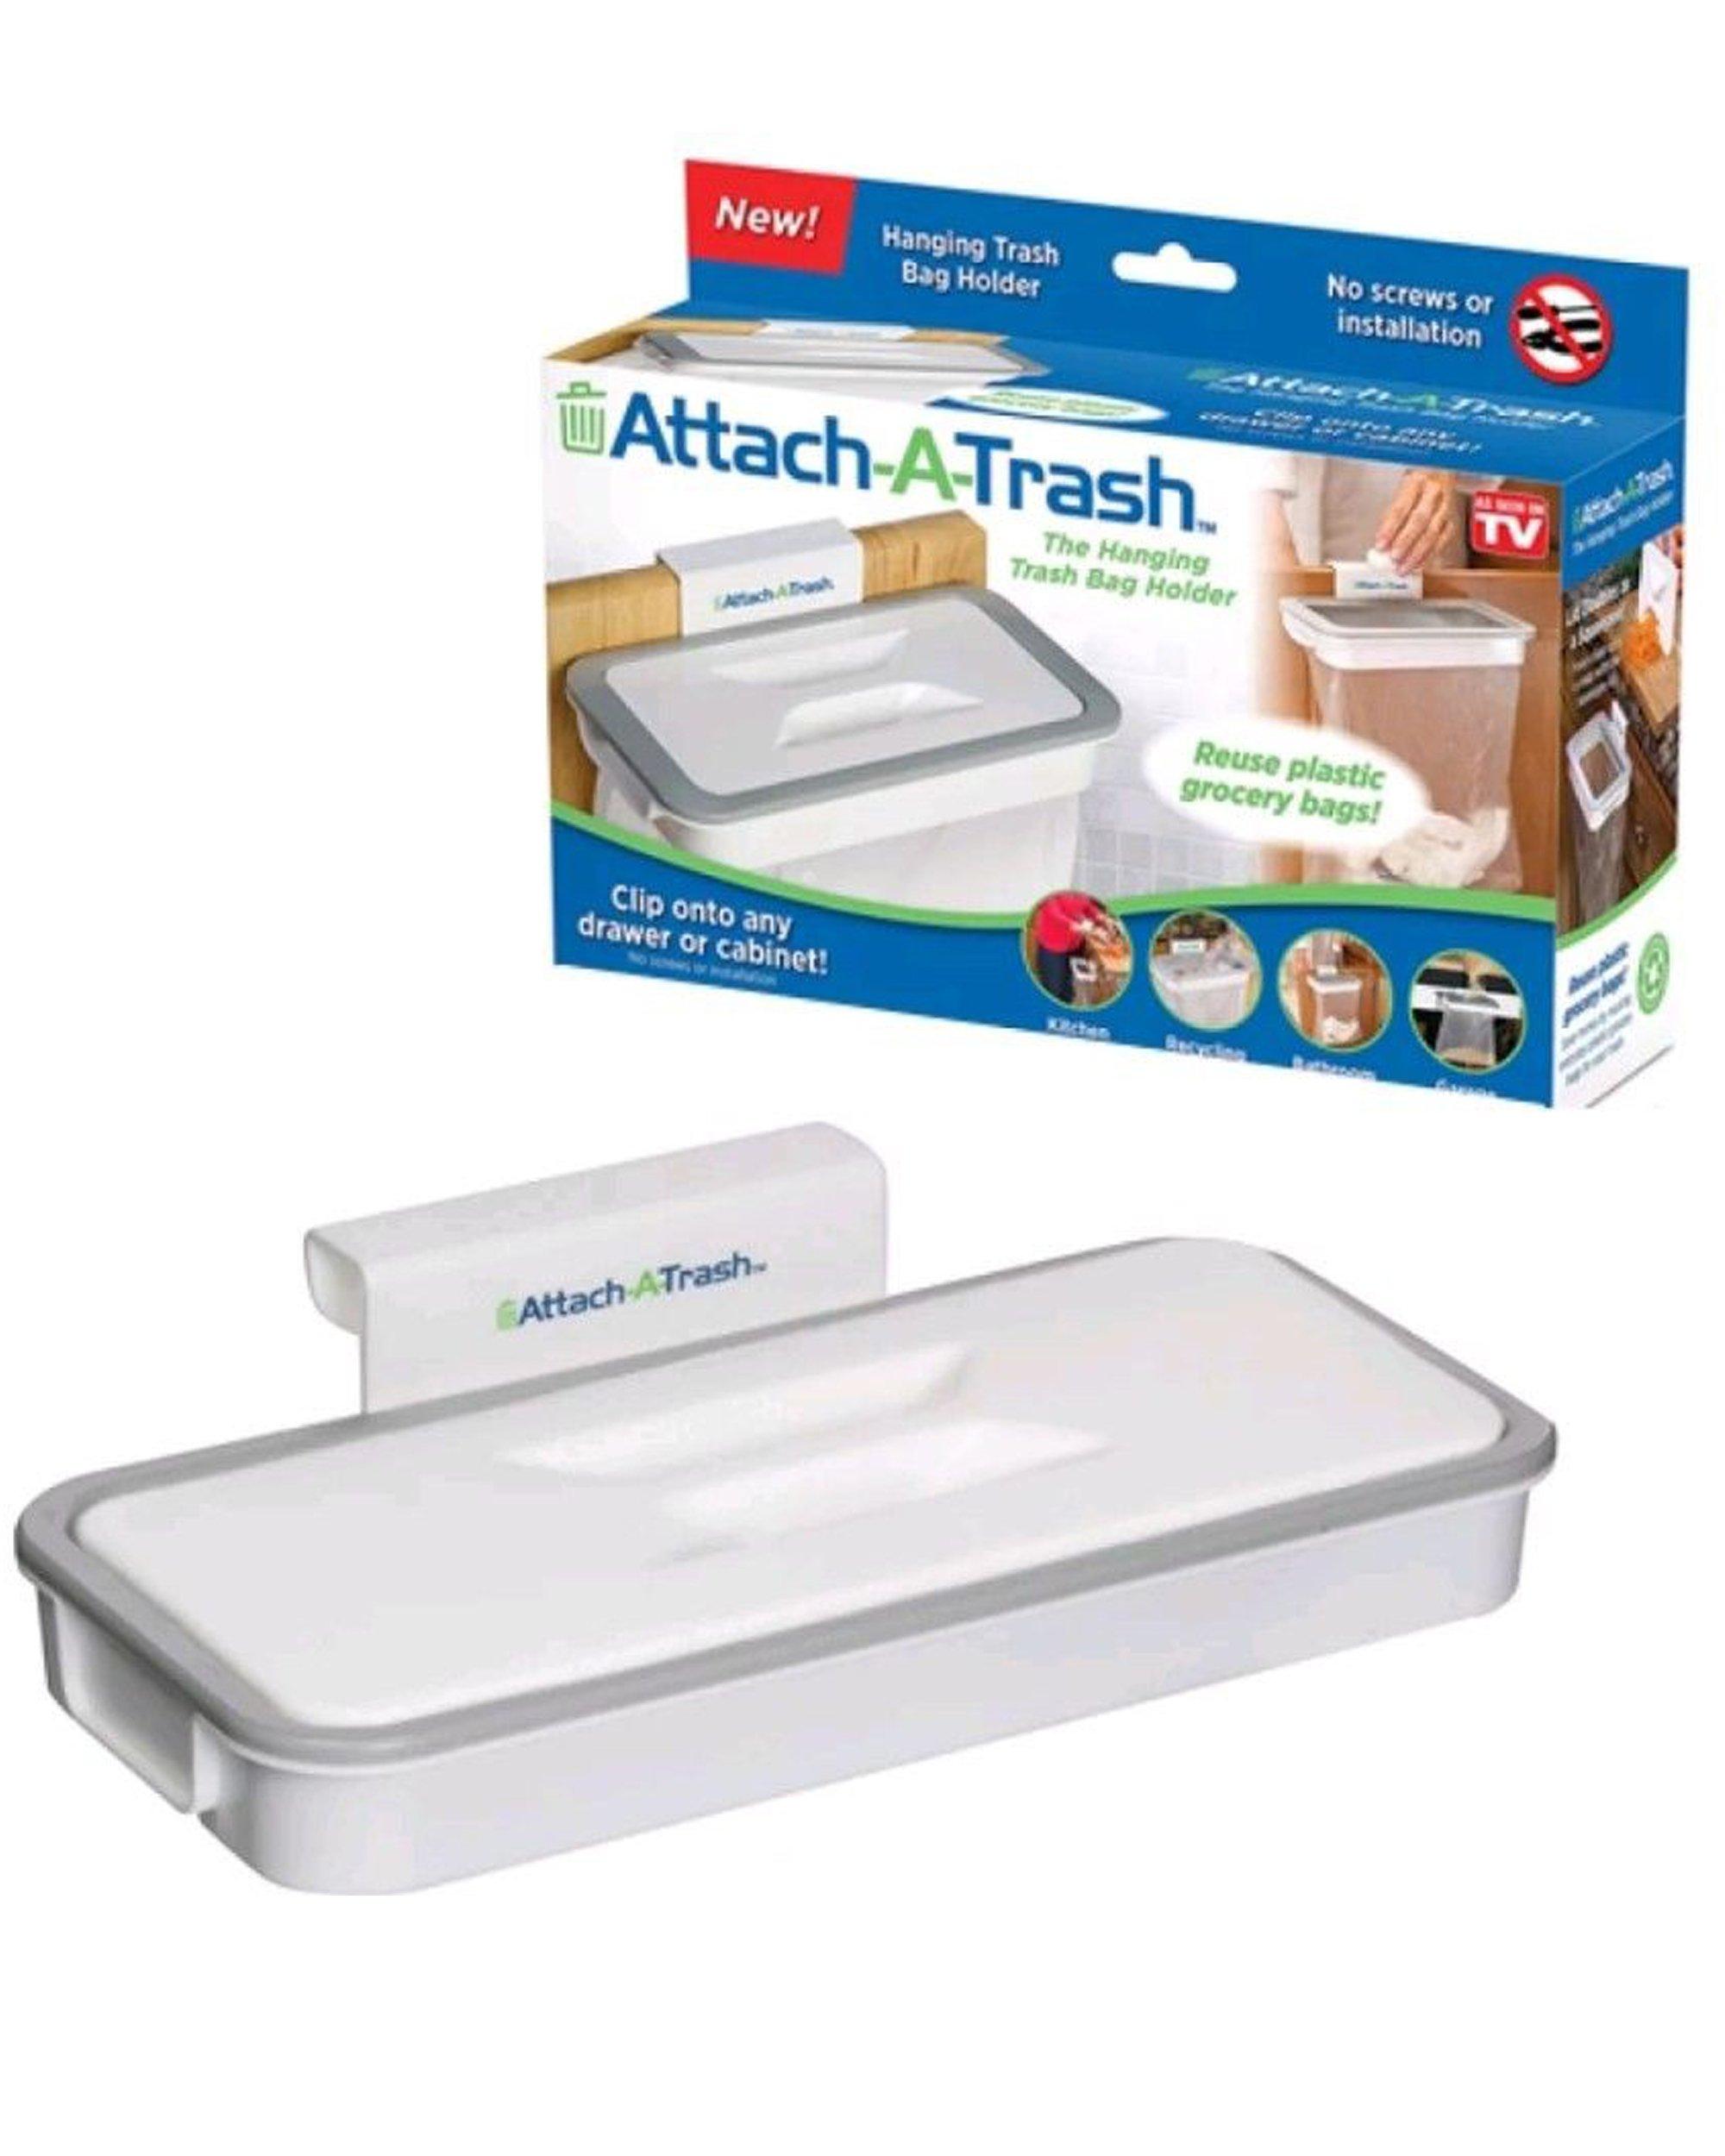 Attach-A-Trash Hanging Trash Bag Holder For Home Kitchen Waste Dirt Rubbish Bin